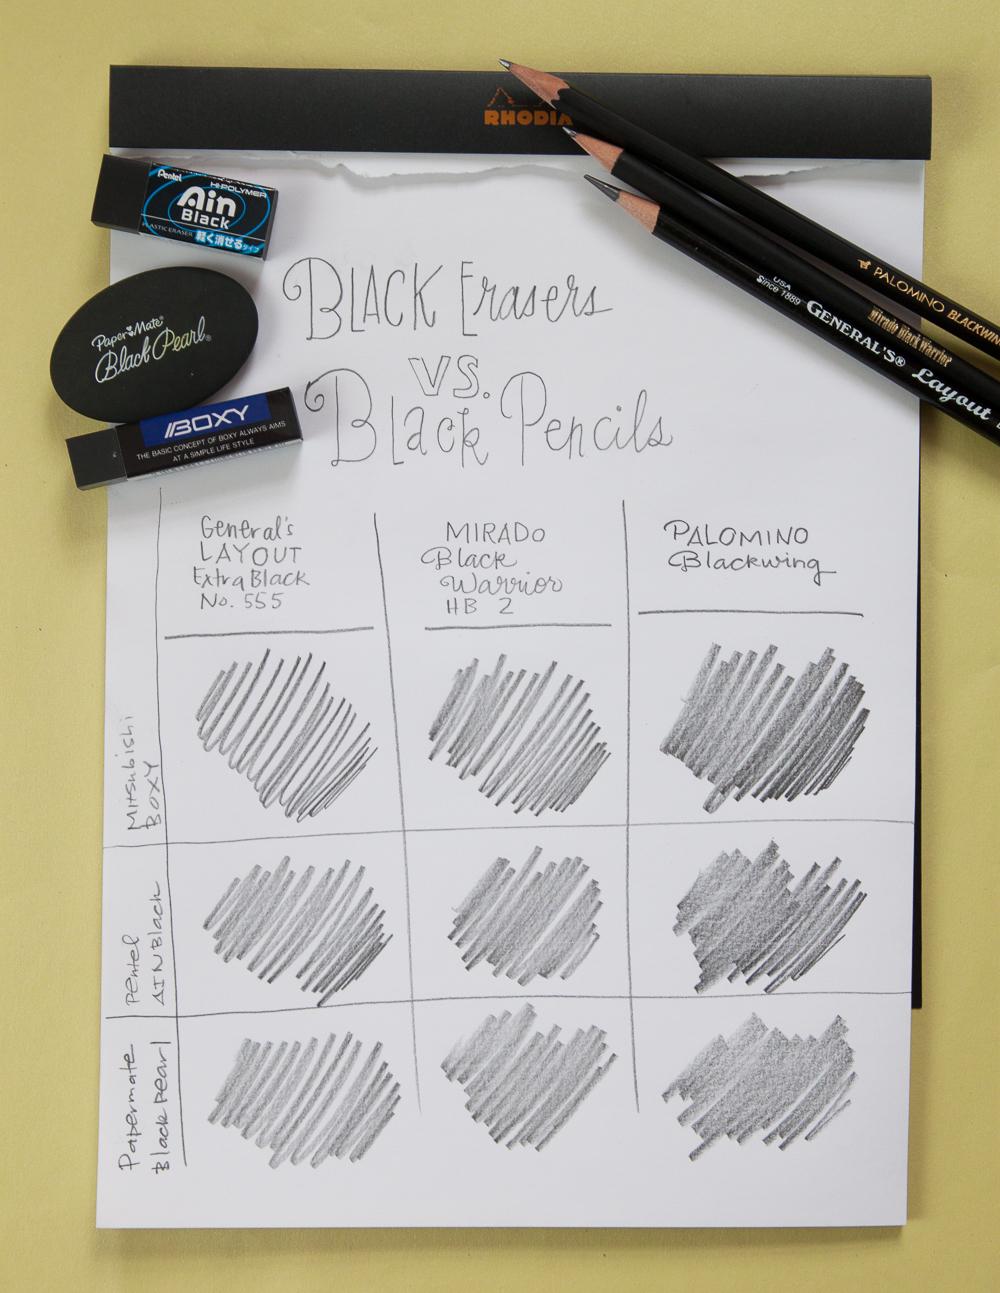 Black Erasers